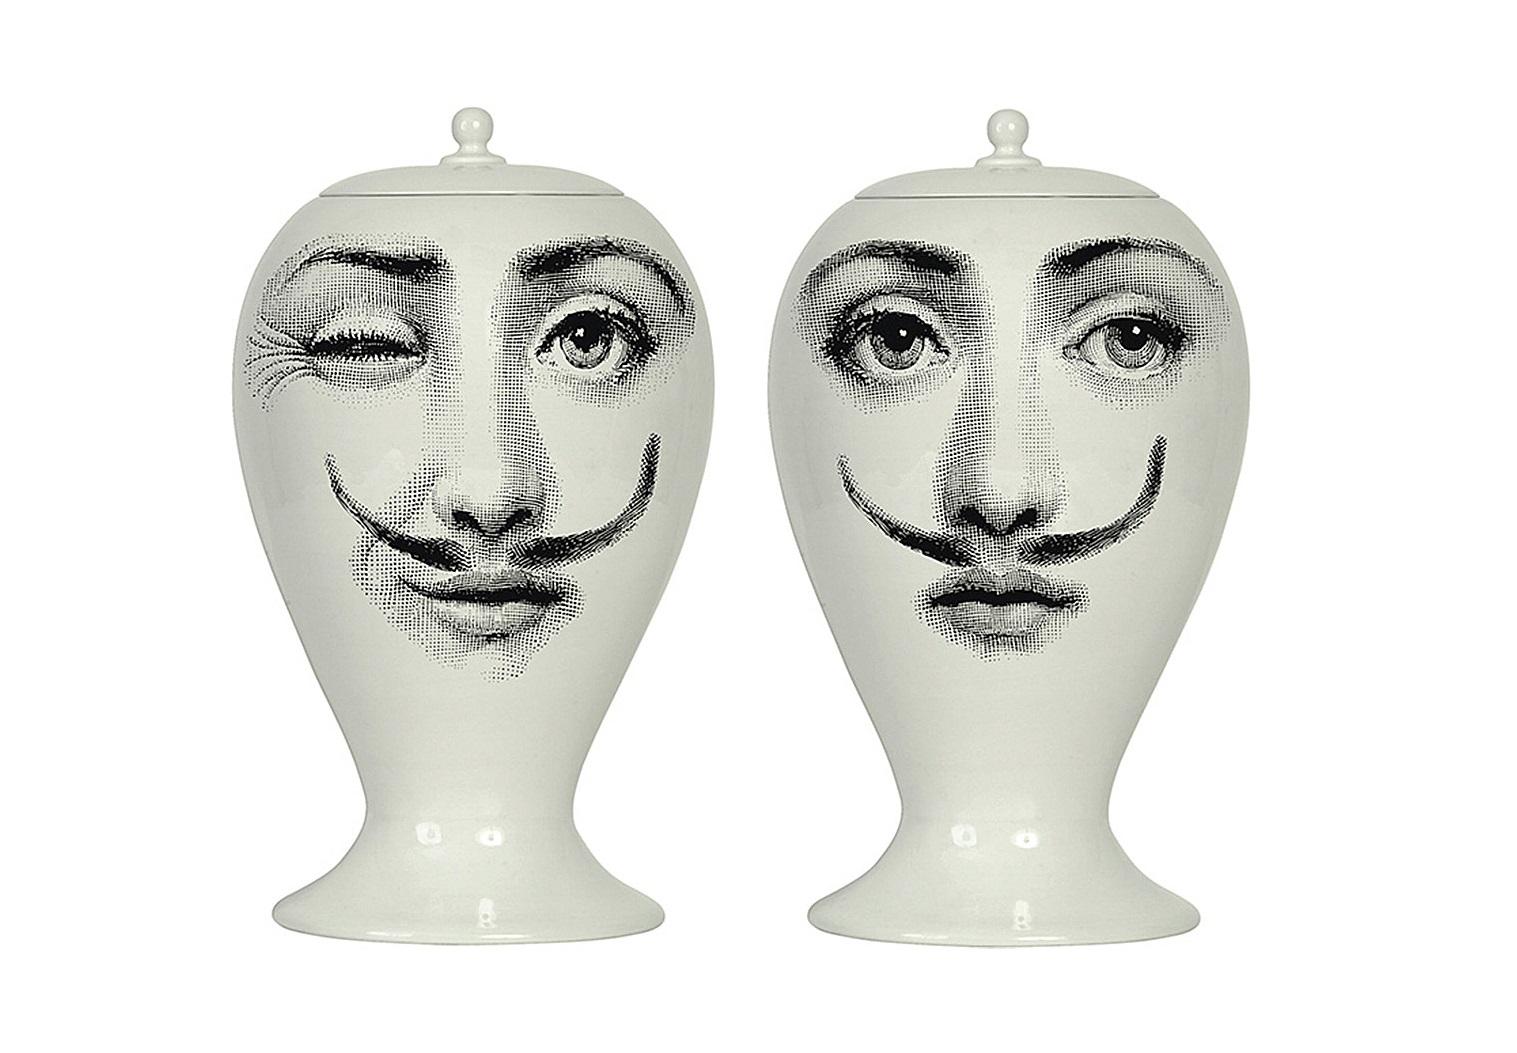 Fasi in porcellana Fornasetti